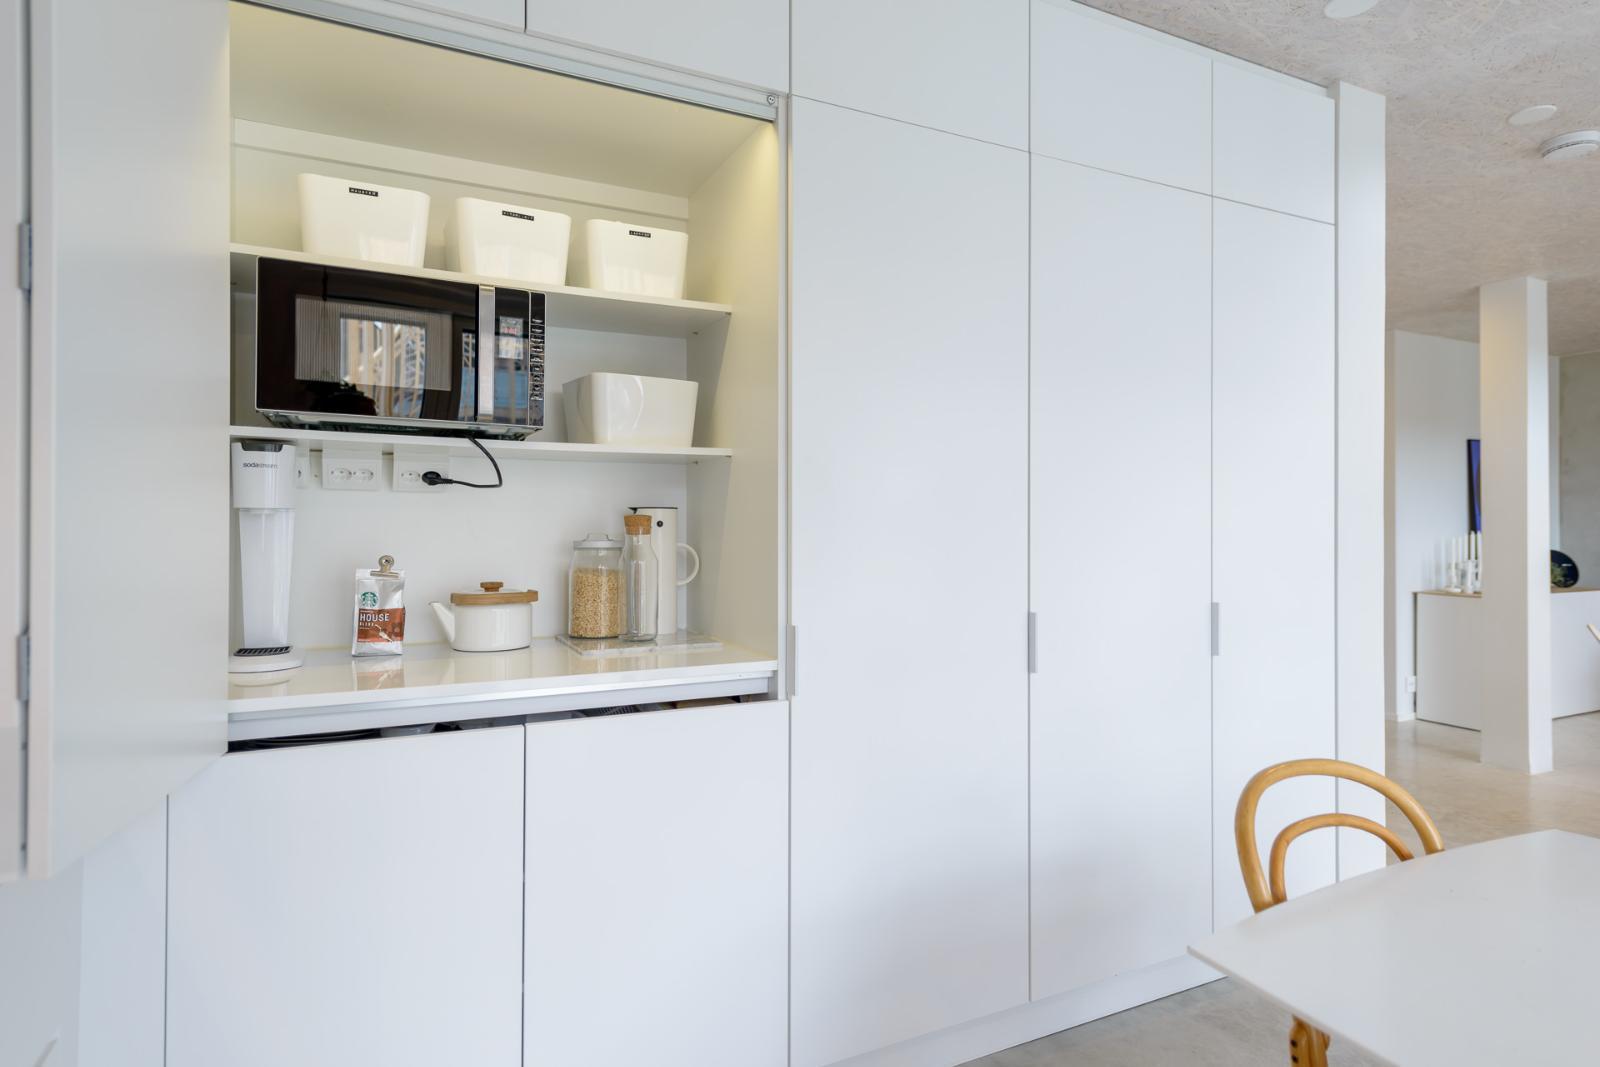 K tev aamiaiskaappi keitti ss ideat vinkit - Ikea cocinas electrodomesticos ...